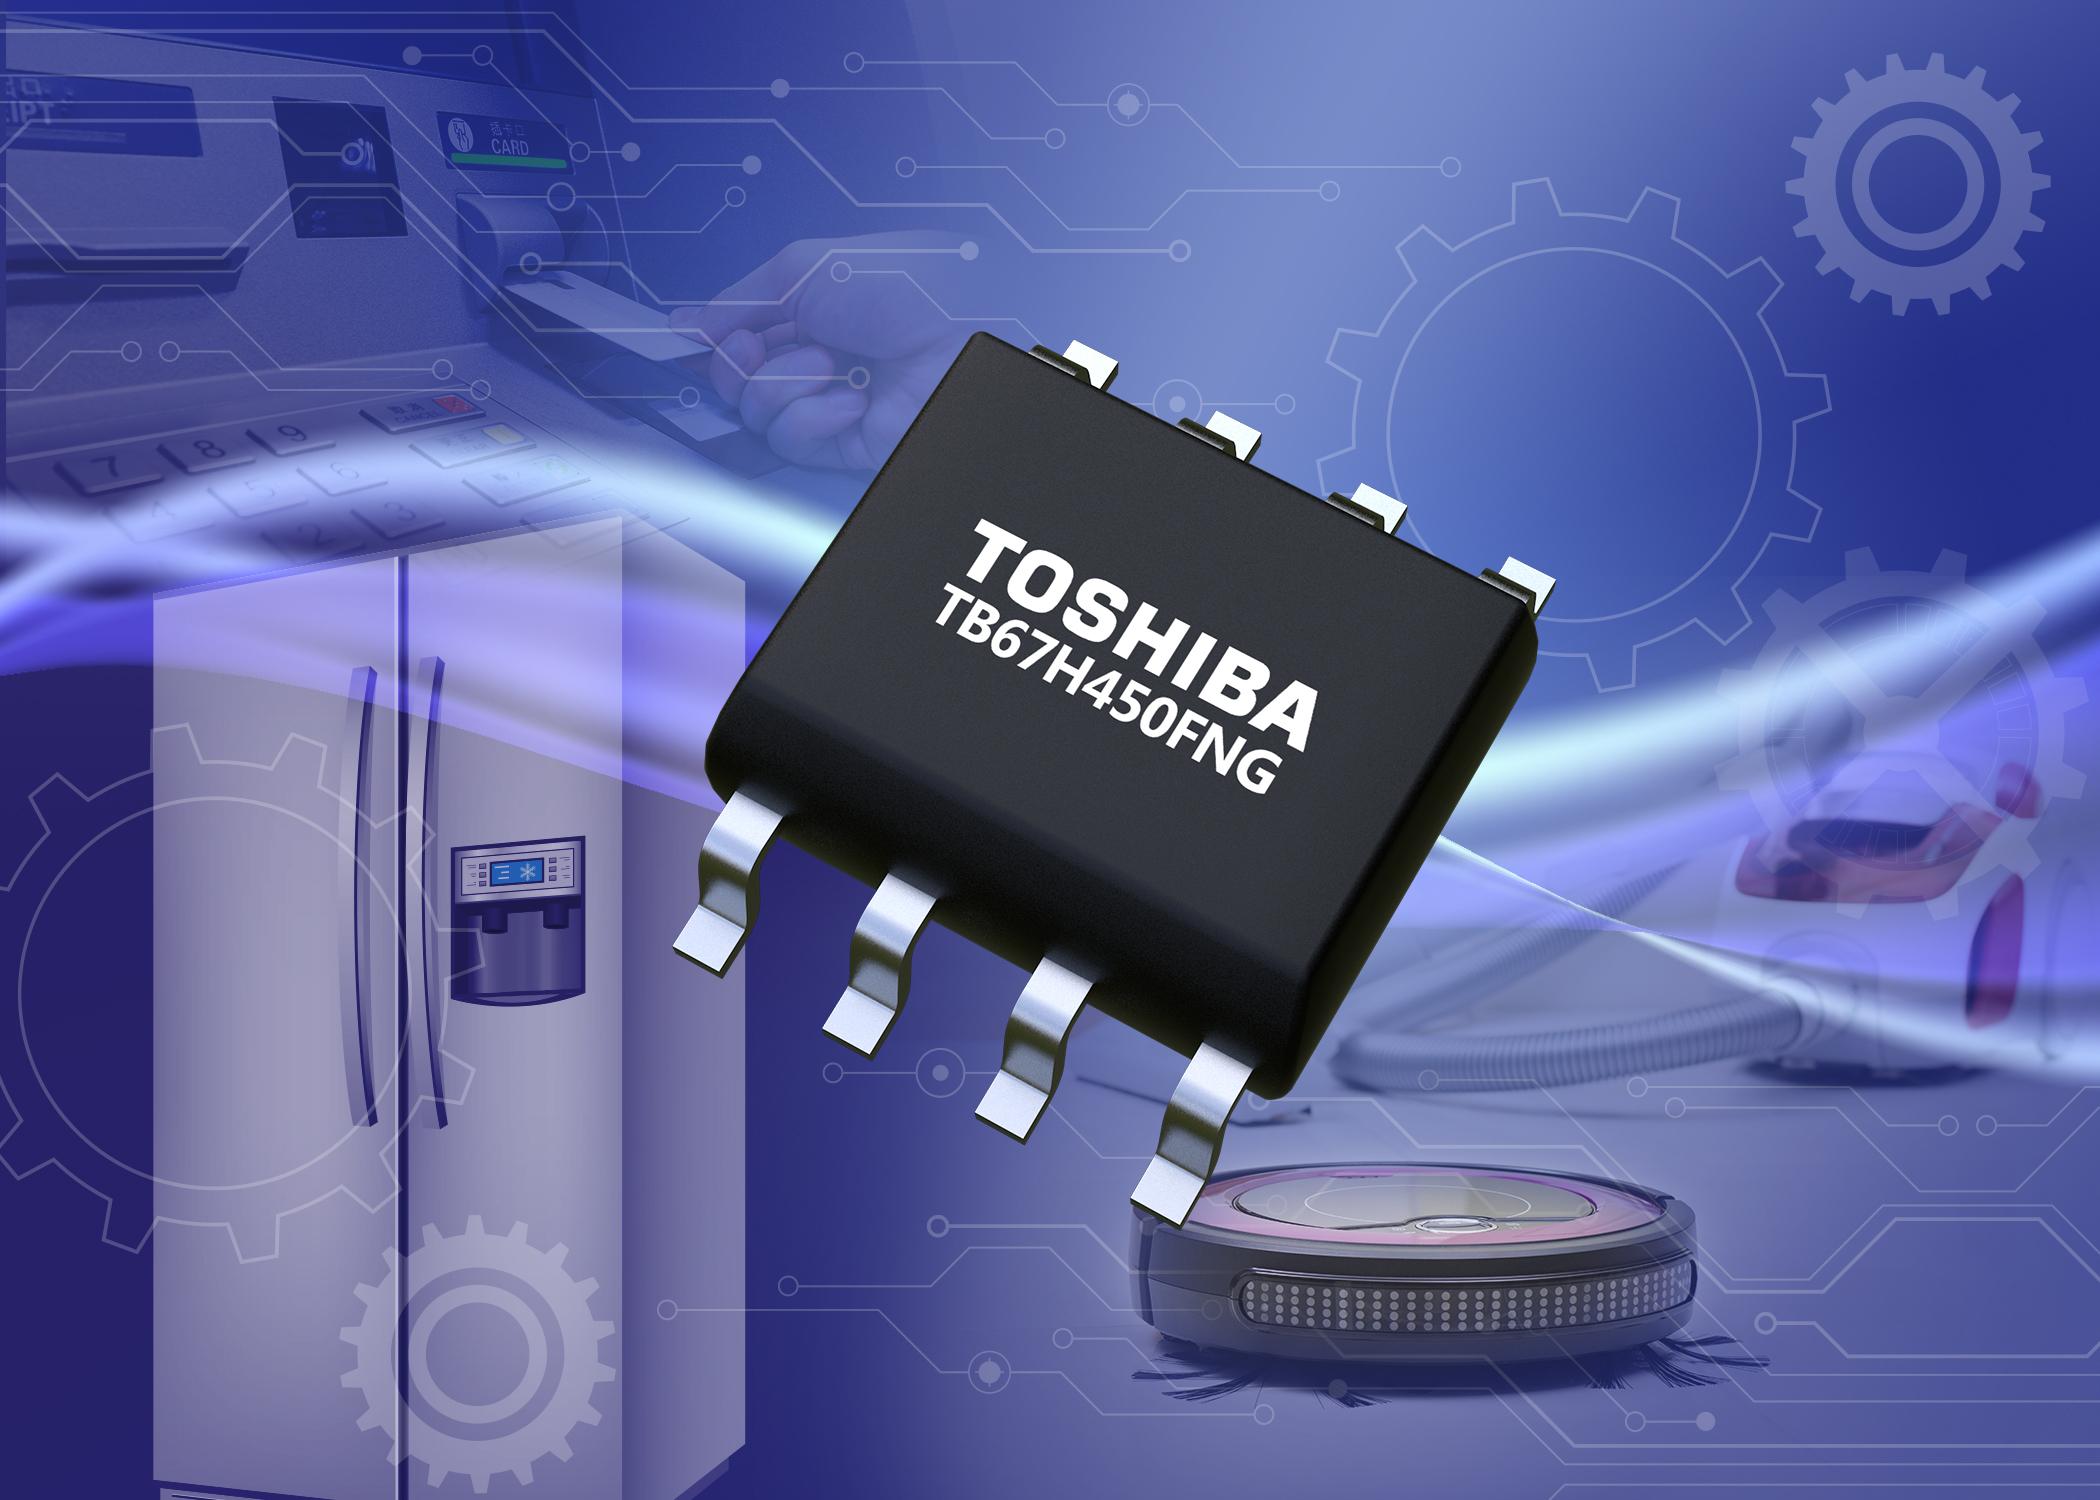 Toshiba_TB67H450FNG_PR.jpg